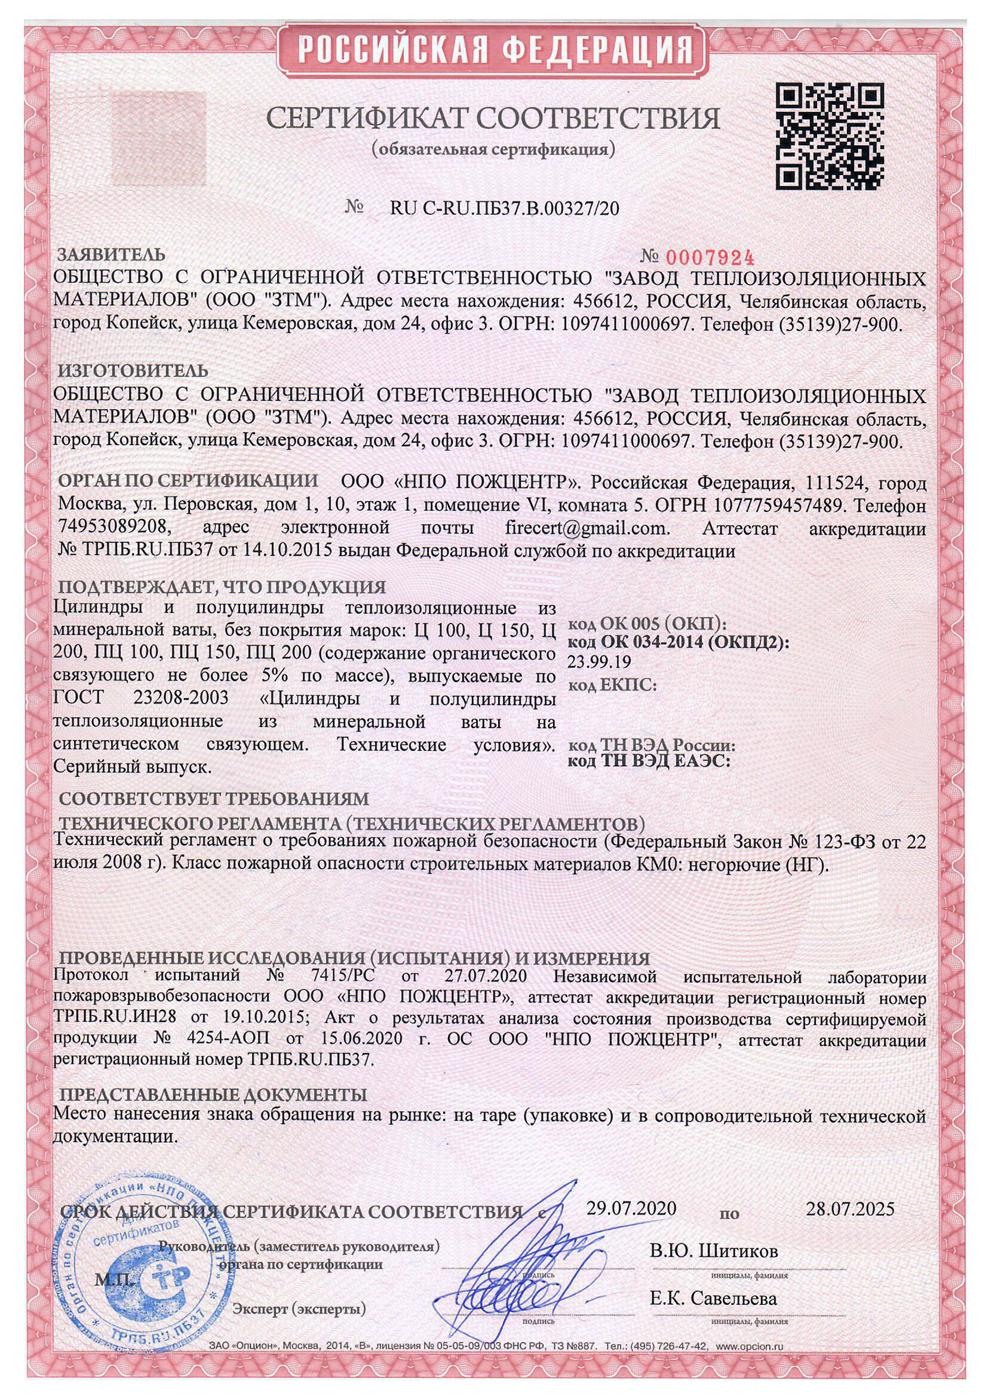 -ГОСТ-23208-2003_2020-2025.jpg